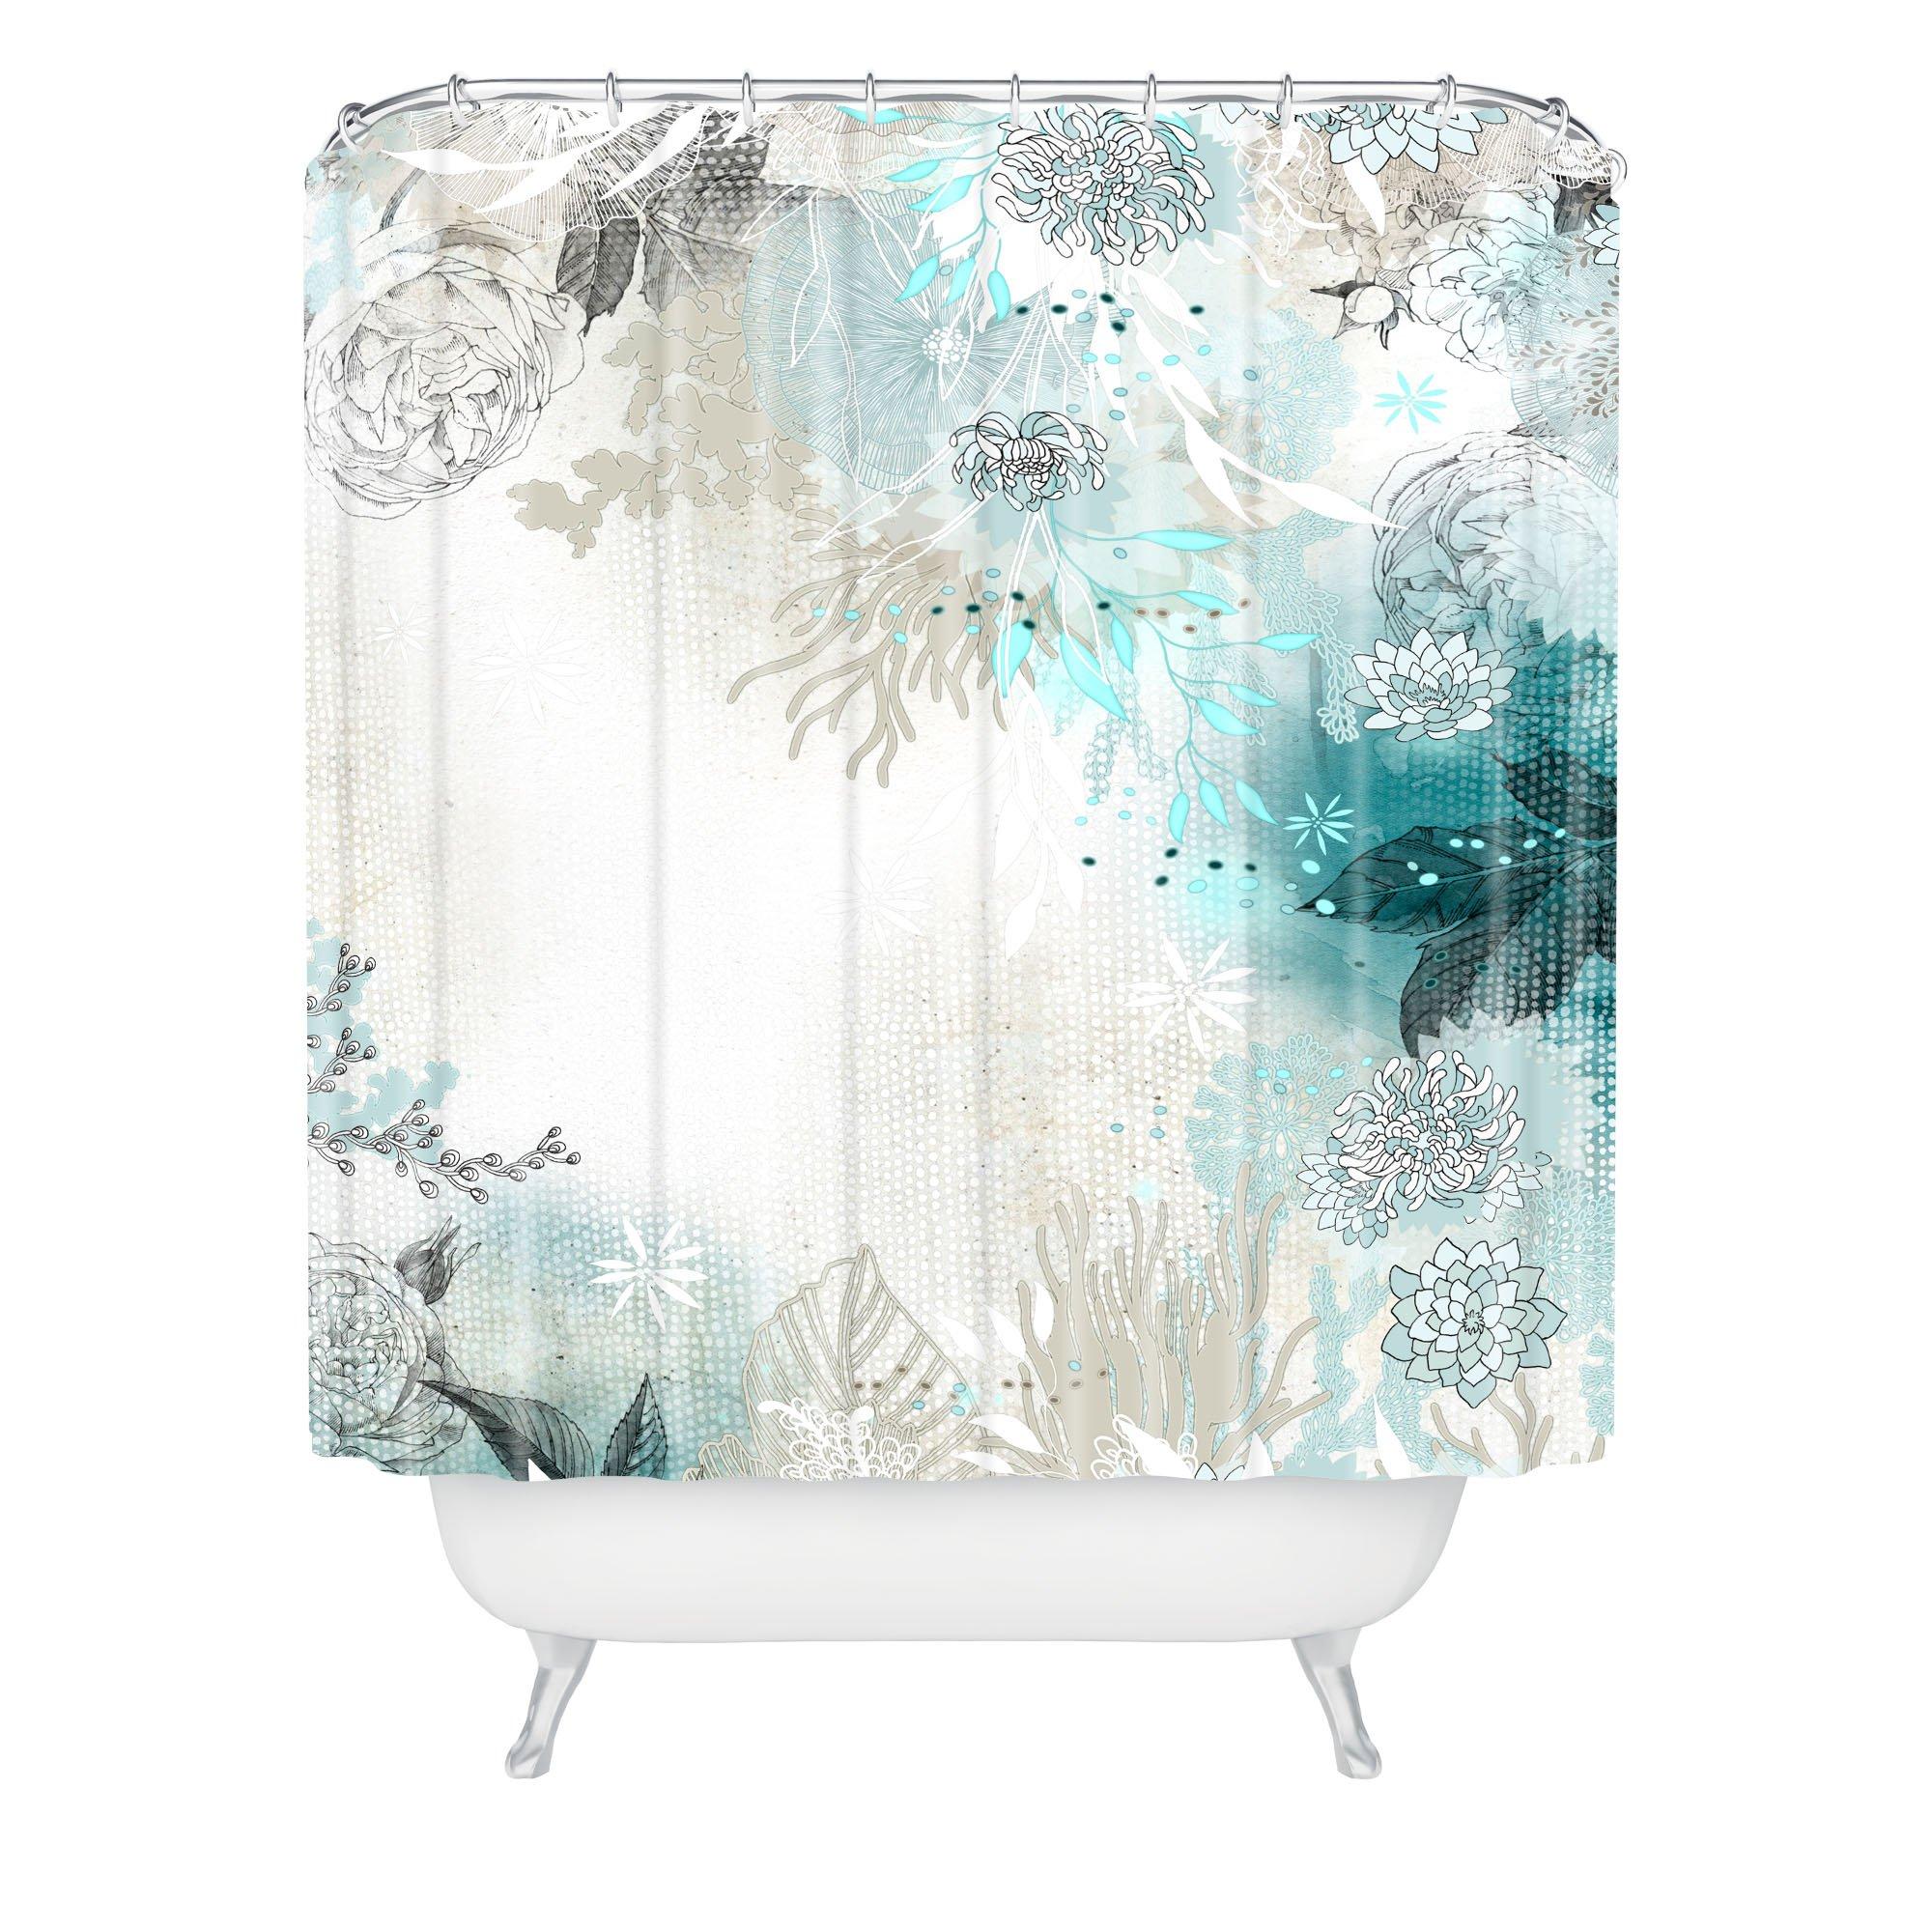 Deny Designs Iveta Abolina Seafoam Shower Curtain, 69'' x 72''